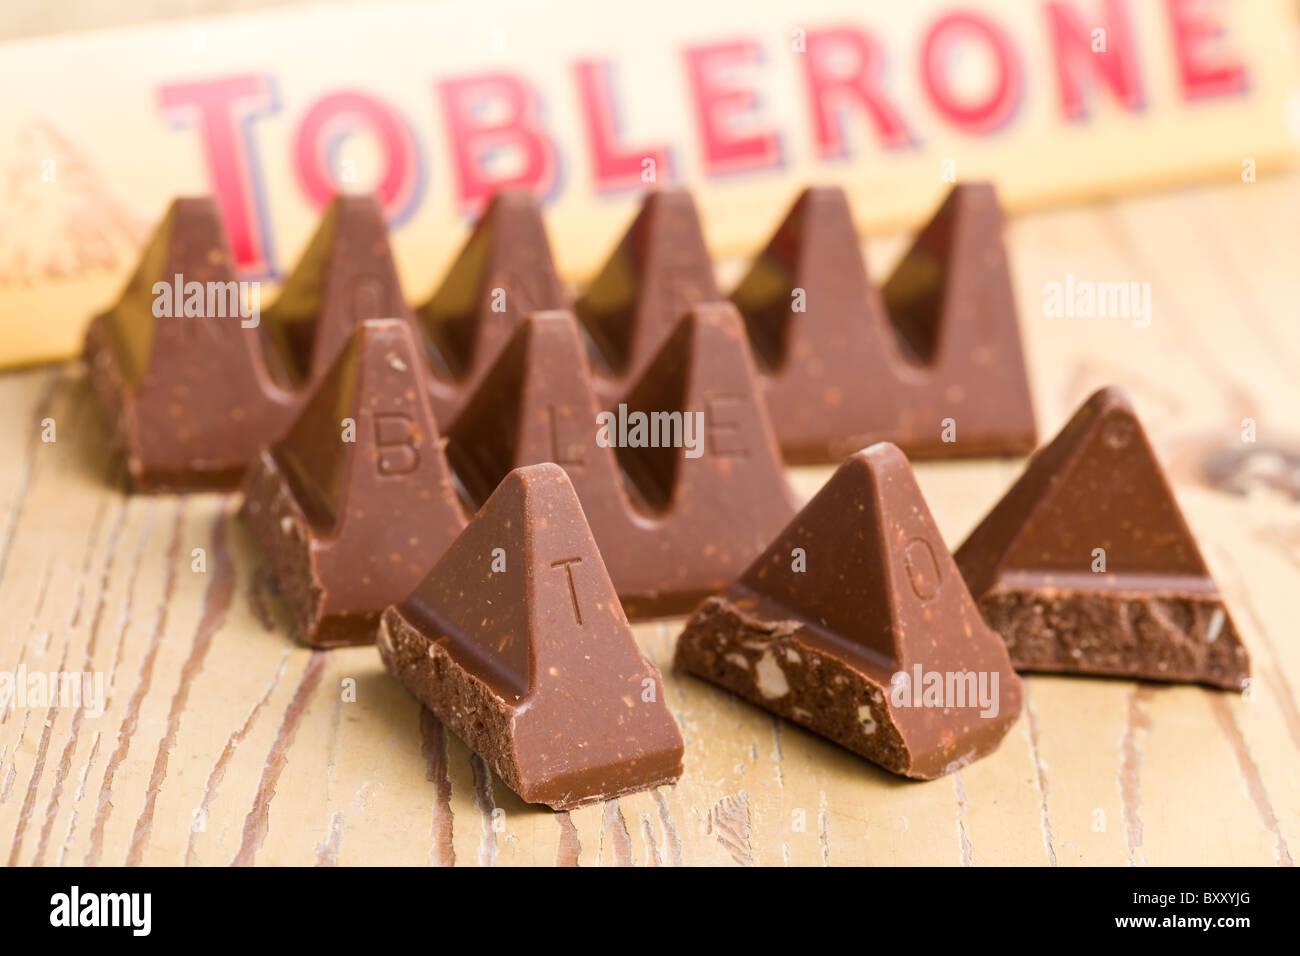 toblerone chocolate Stock Photo, Royalty Free Image: 33783864 - Alamy